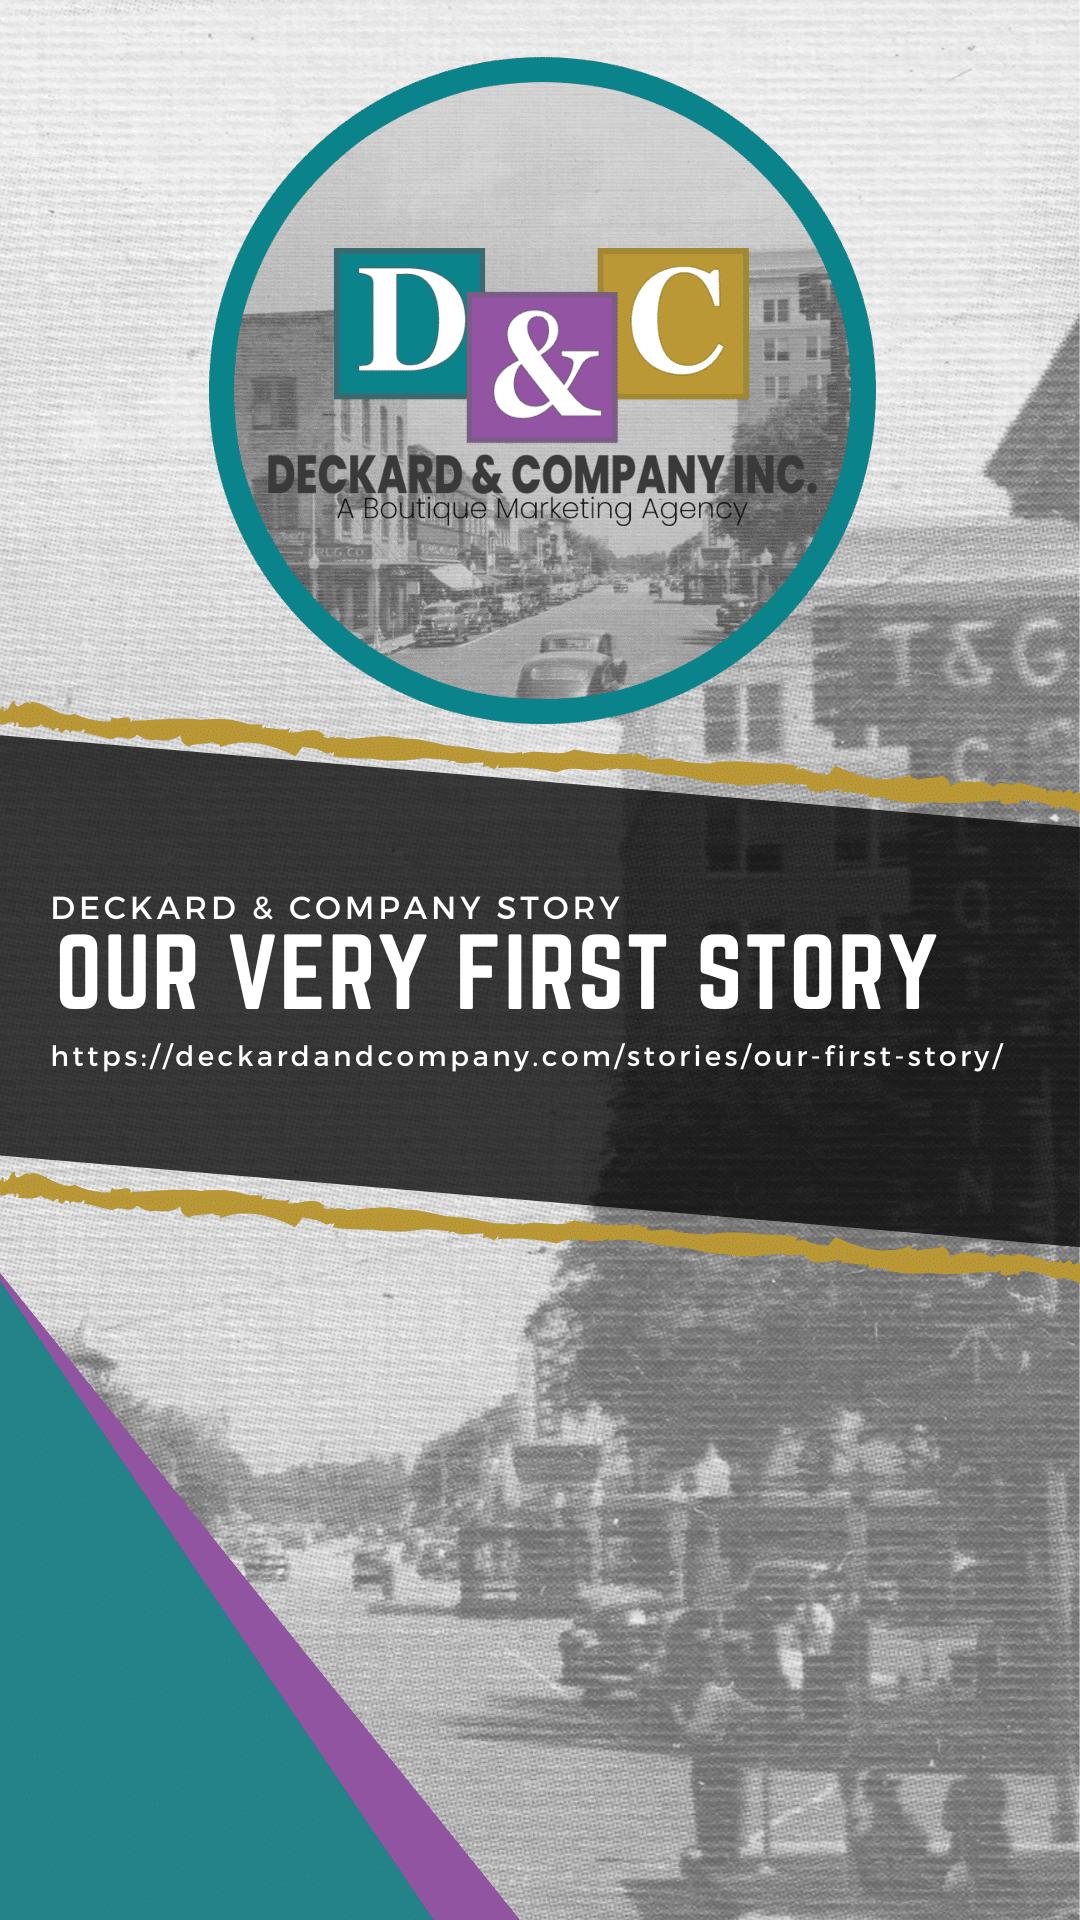 Deckard & Company's very first WordPress Google Story